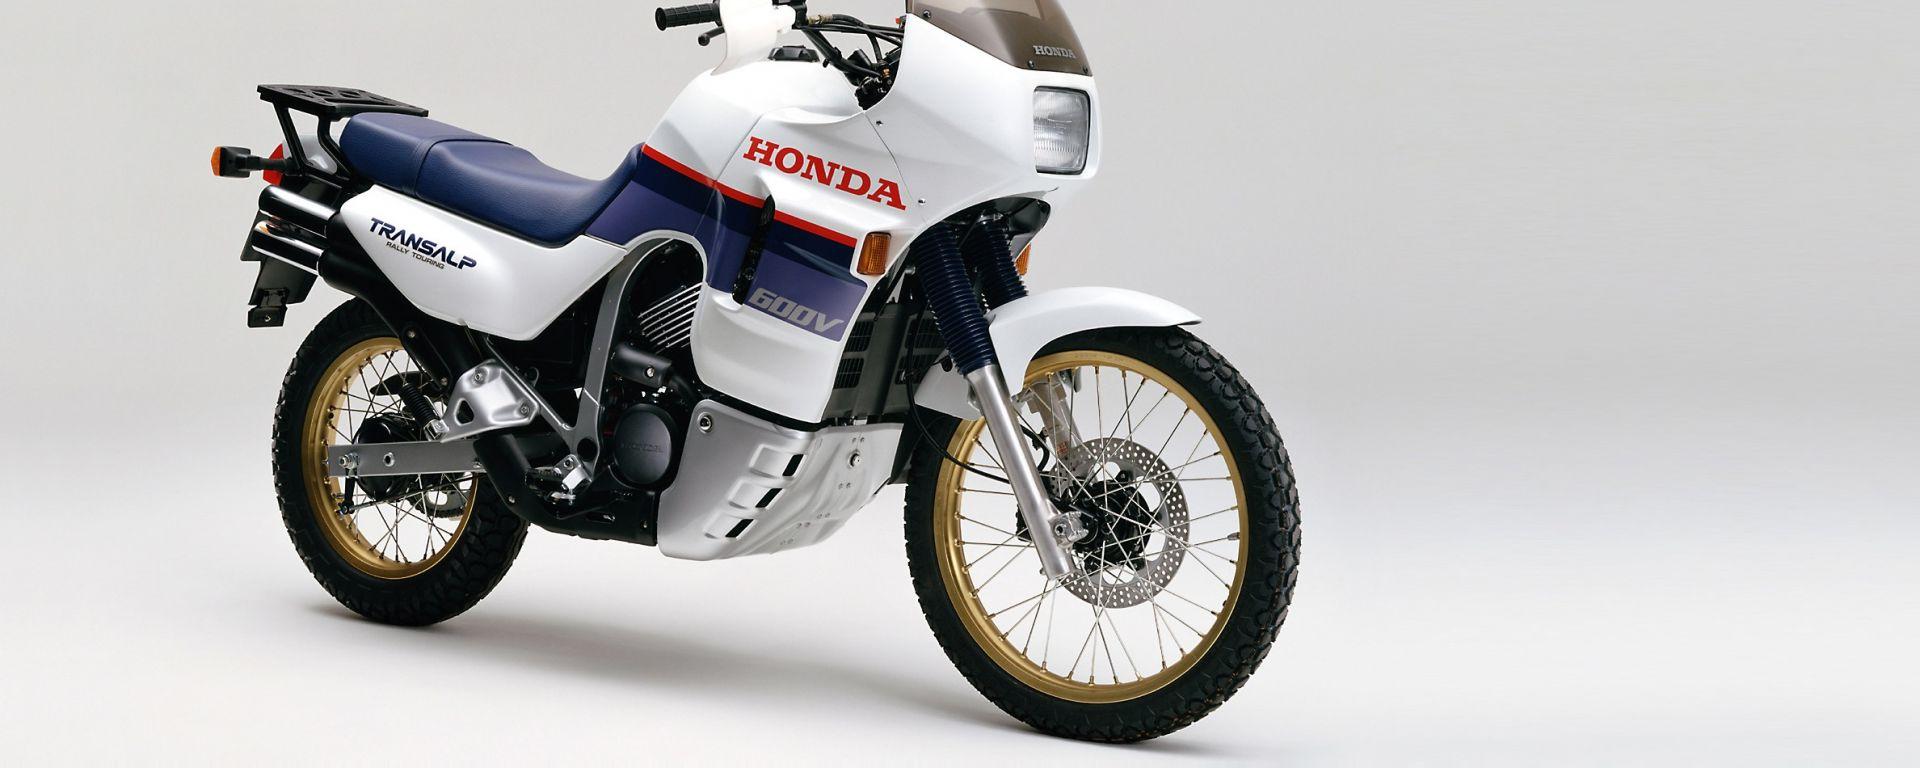 Honda Transalp, è la volta buona? Honda registra il nome